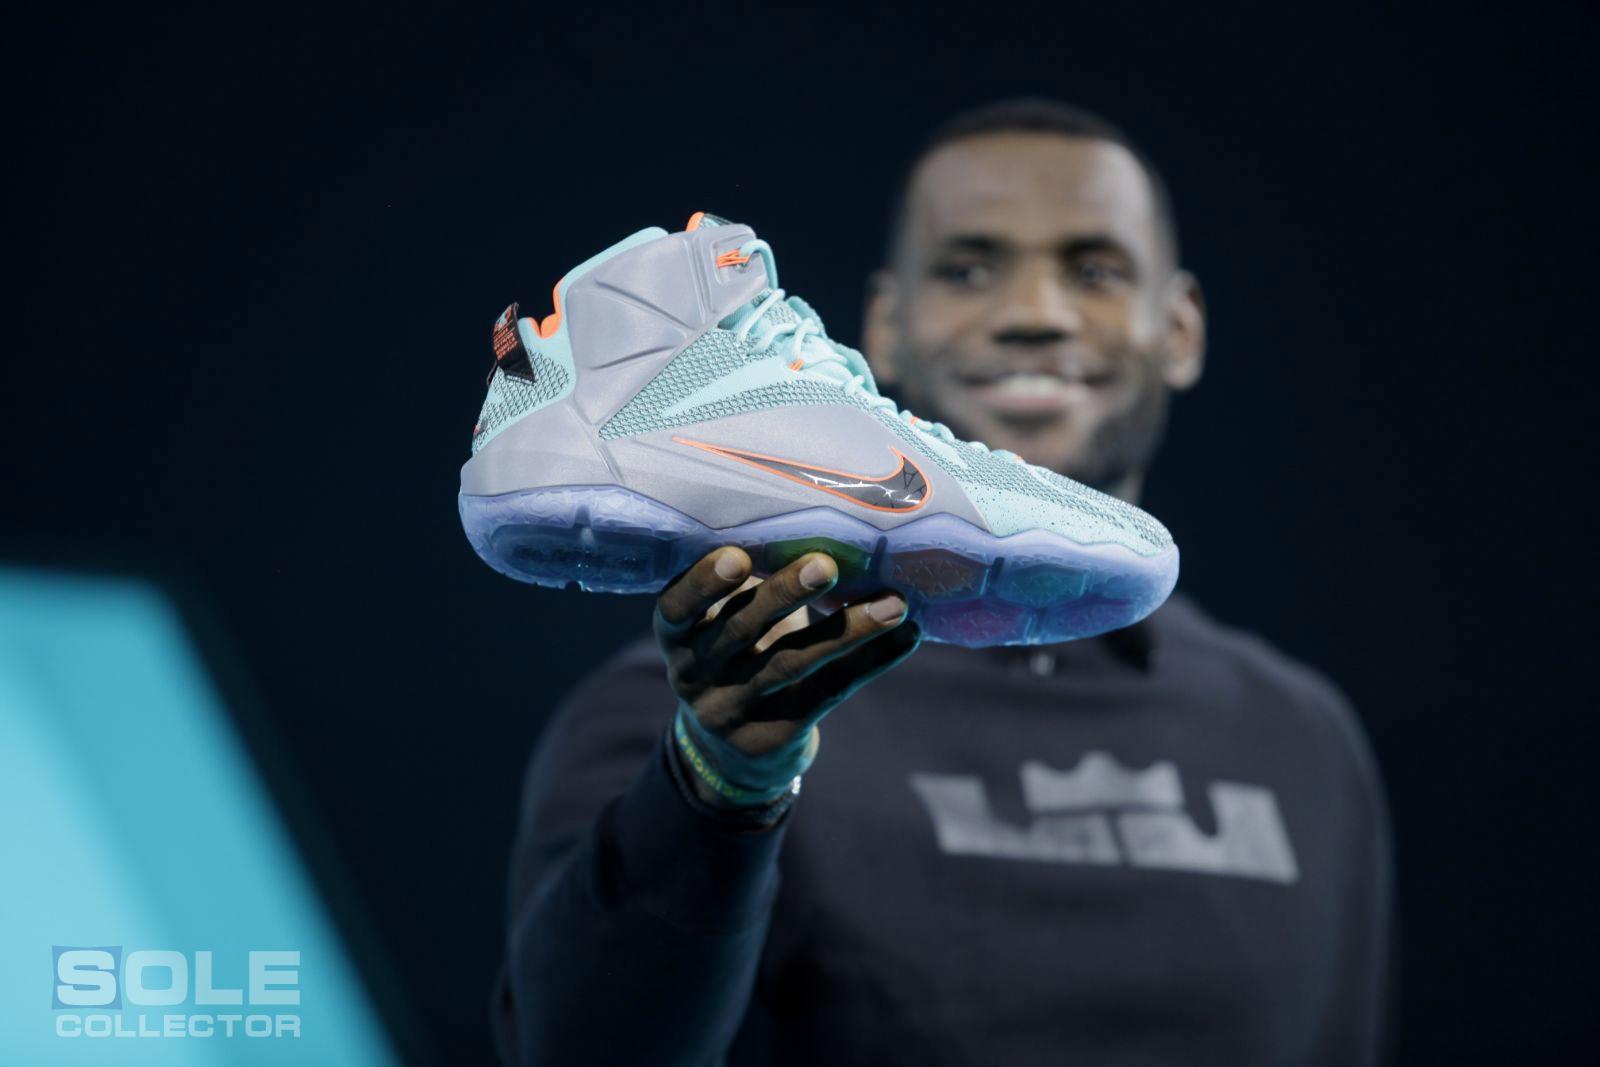 lebron james shoe size - photo #42